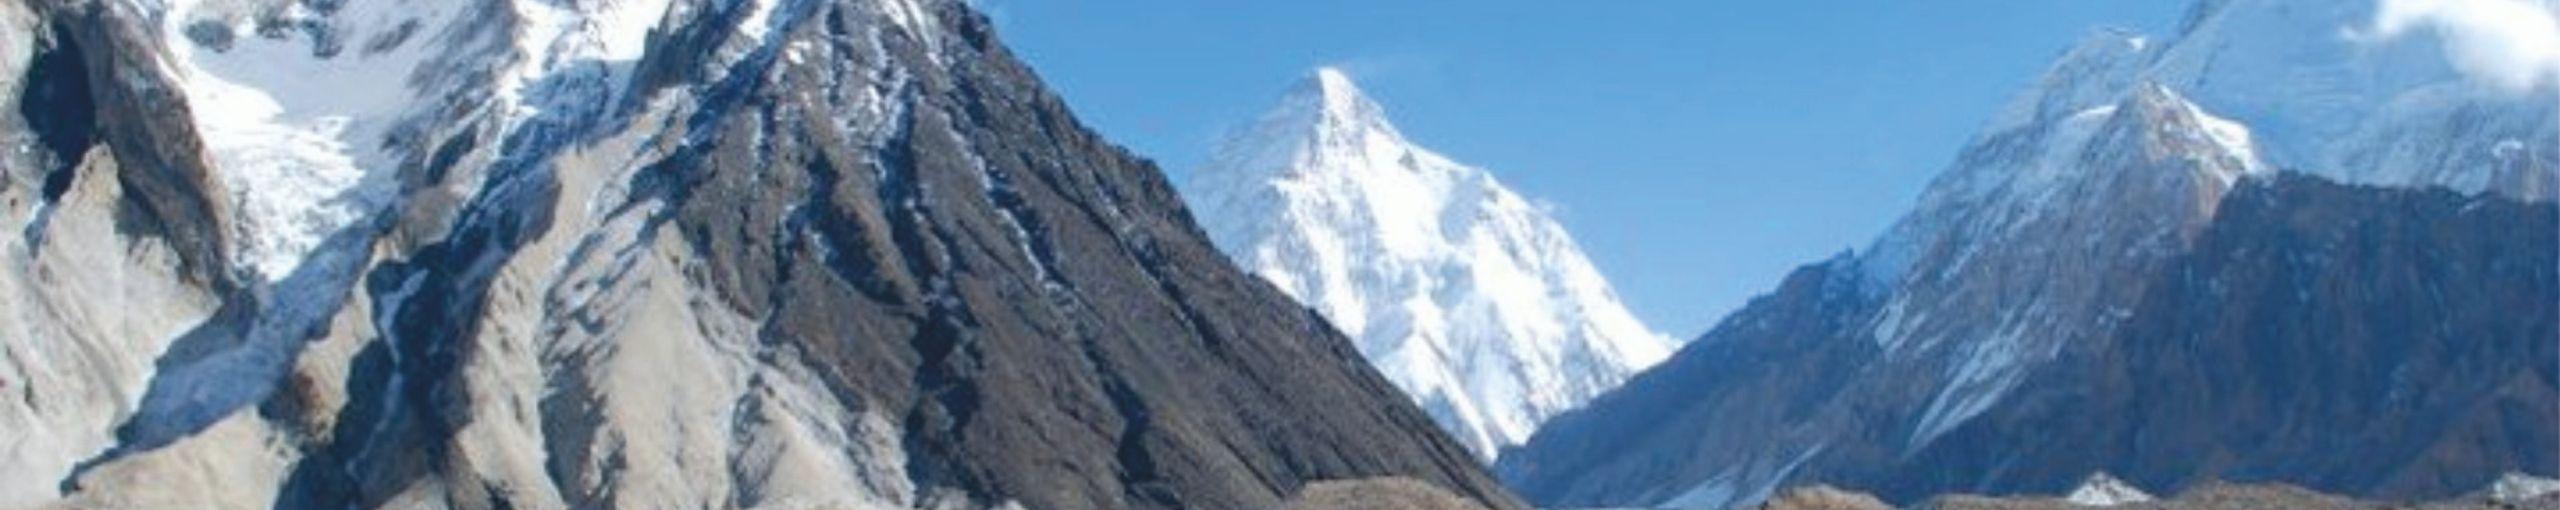 K2 Rey del Karakorum